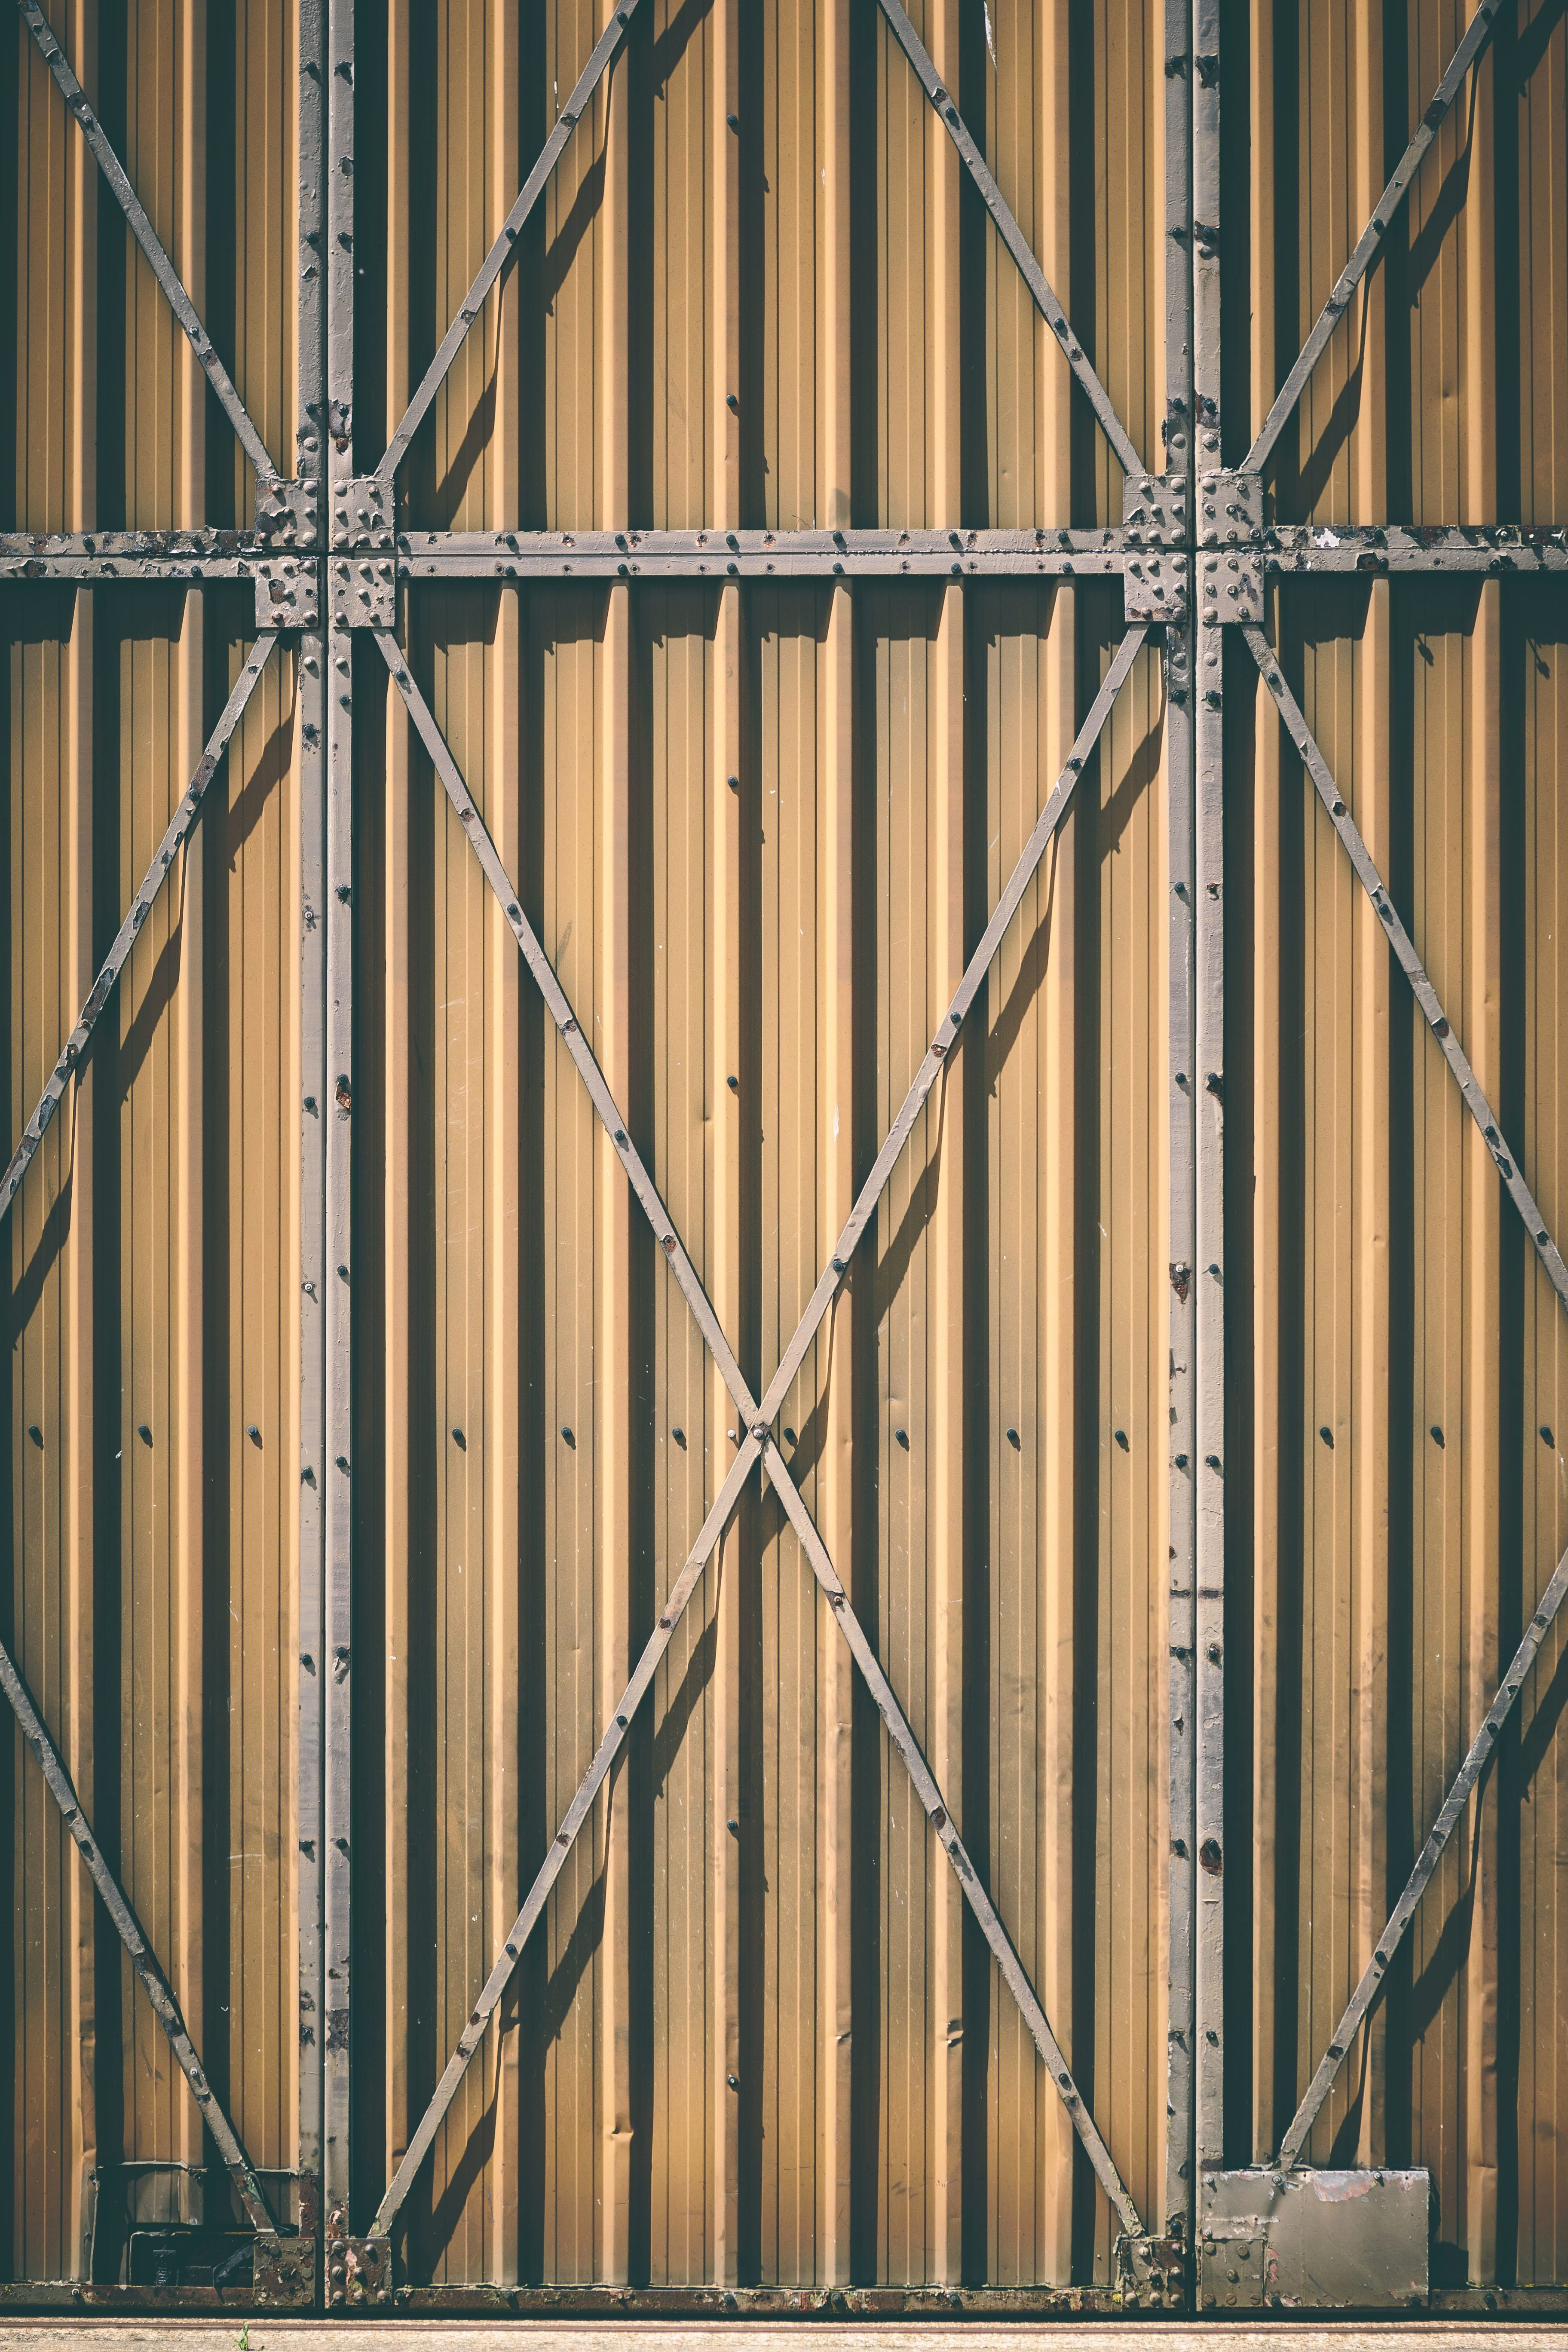 Imagen gratis acero estructura textura pared gris metal puerta